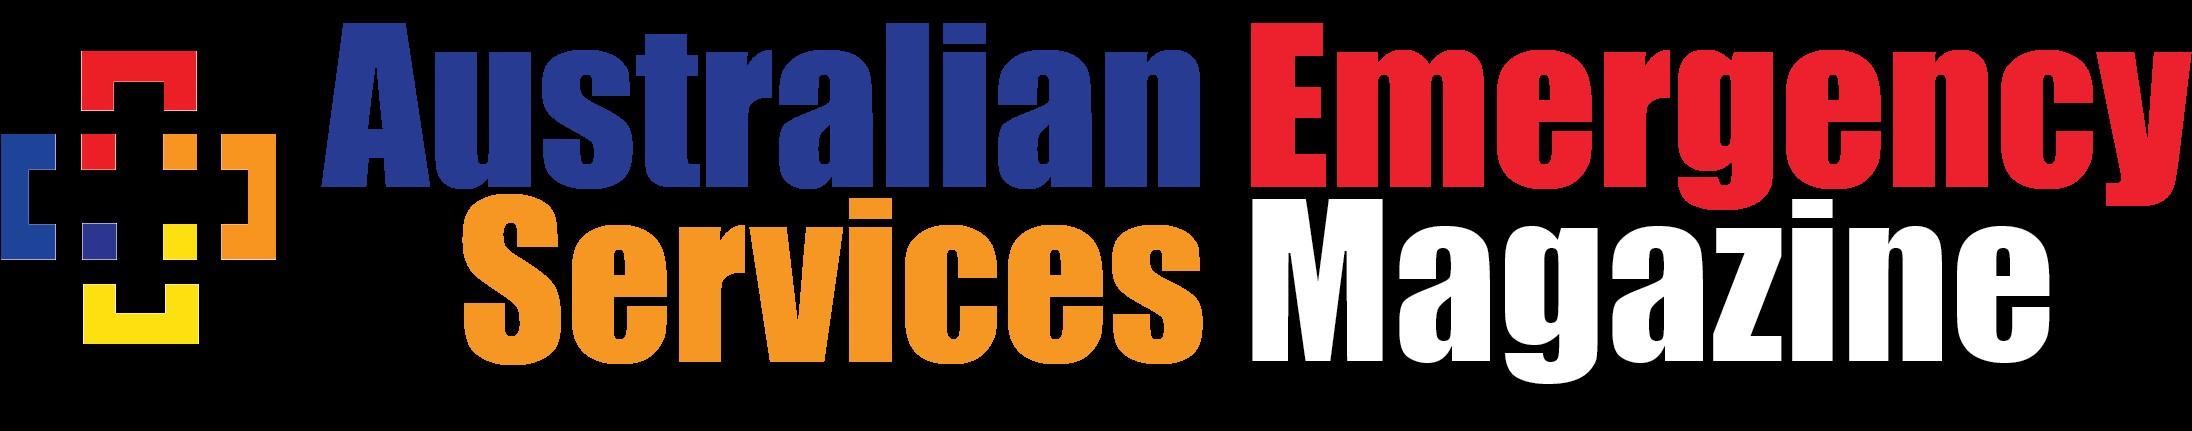 AUSTRALIAN EMERGENCY SERVICES MAGAZINE